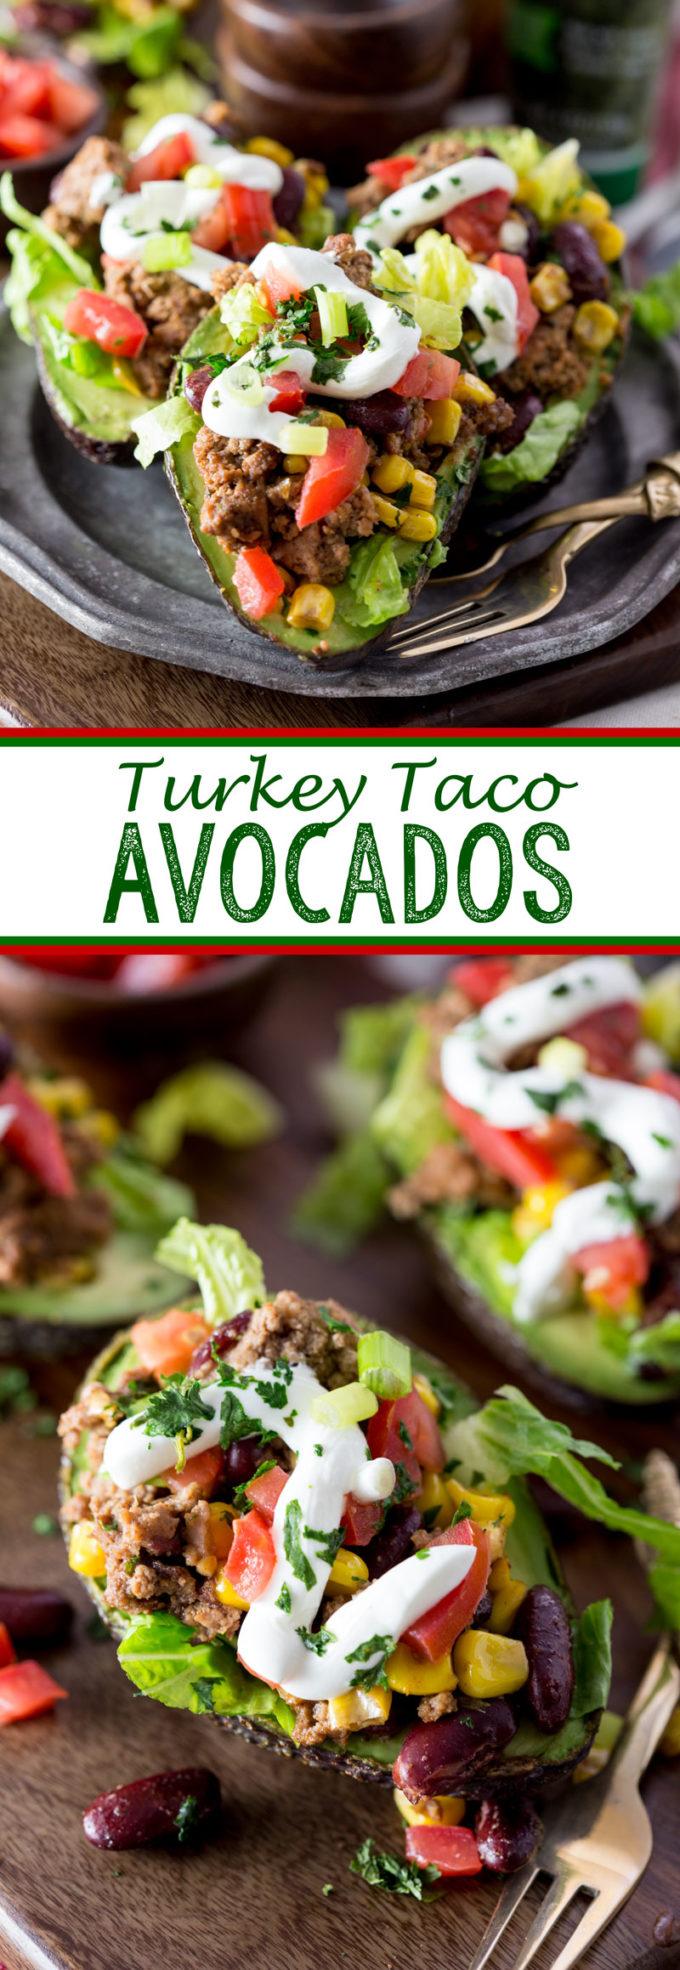 Turkey Taco Avocados, stuffed avocados with ground turkey, beans, corn, etc.